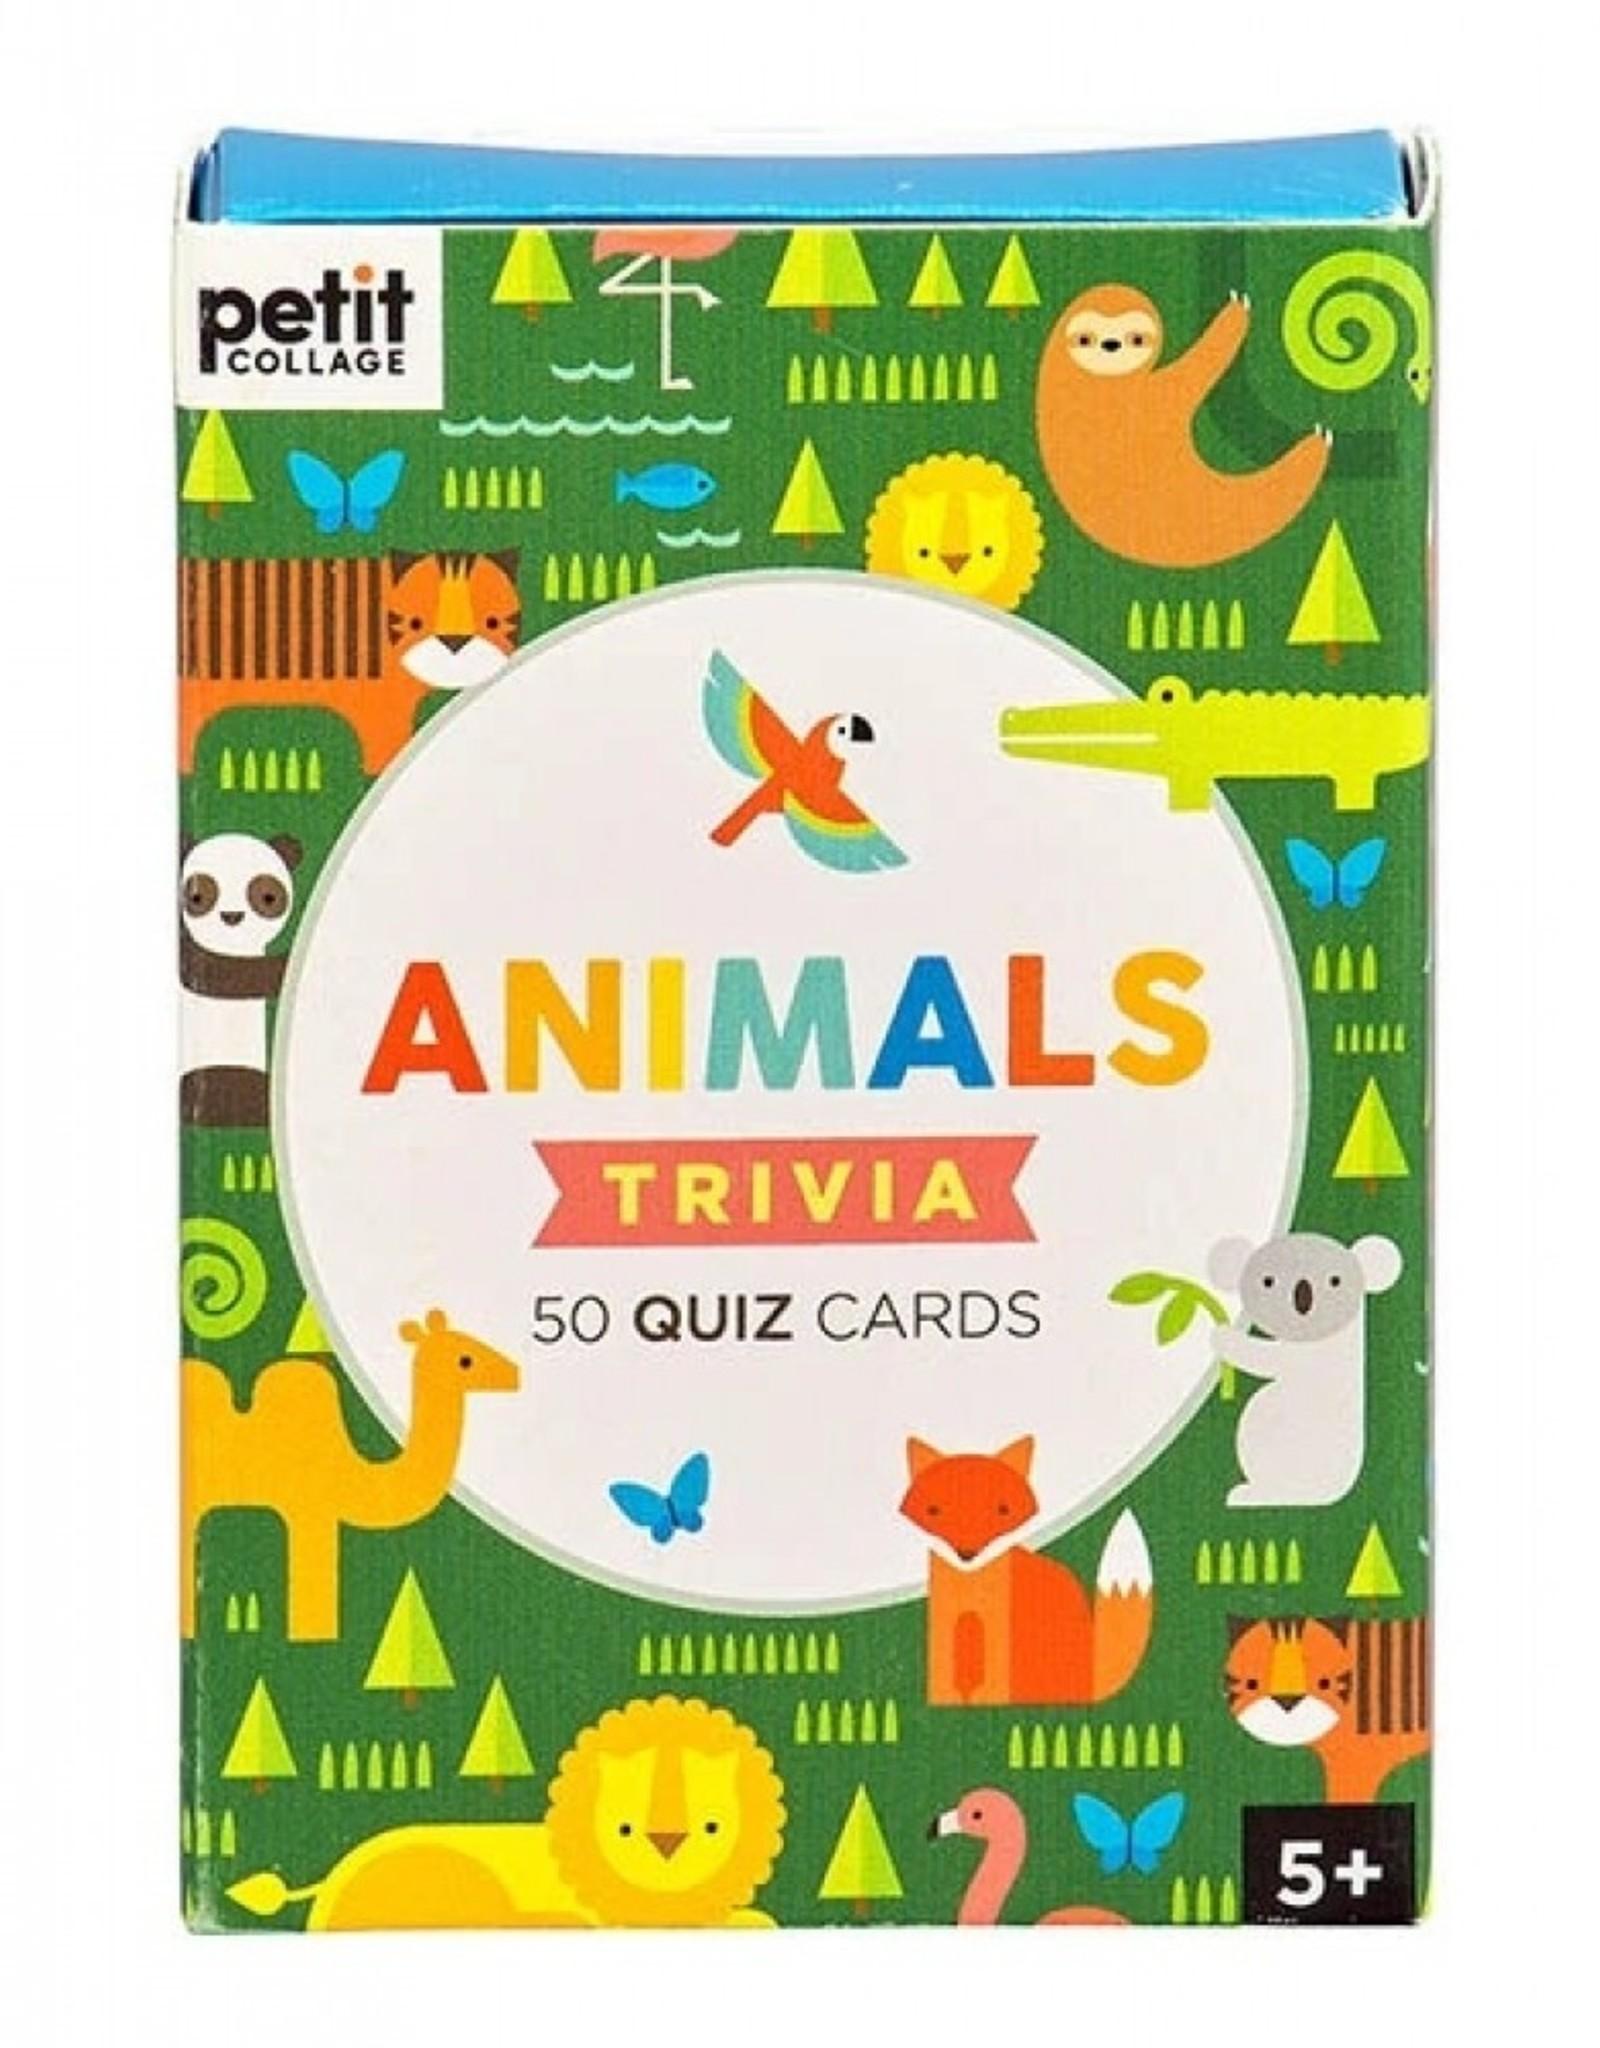 Petit Collage PTC473 - Animal Trivia Cards